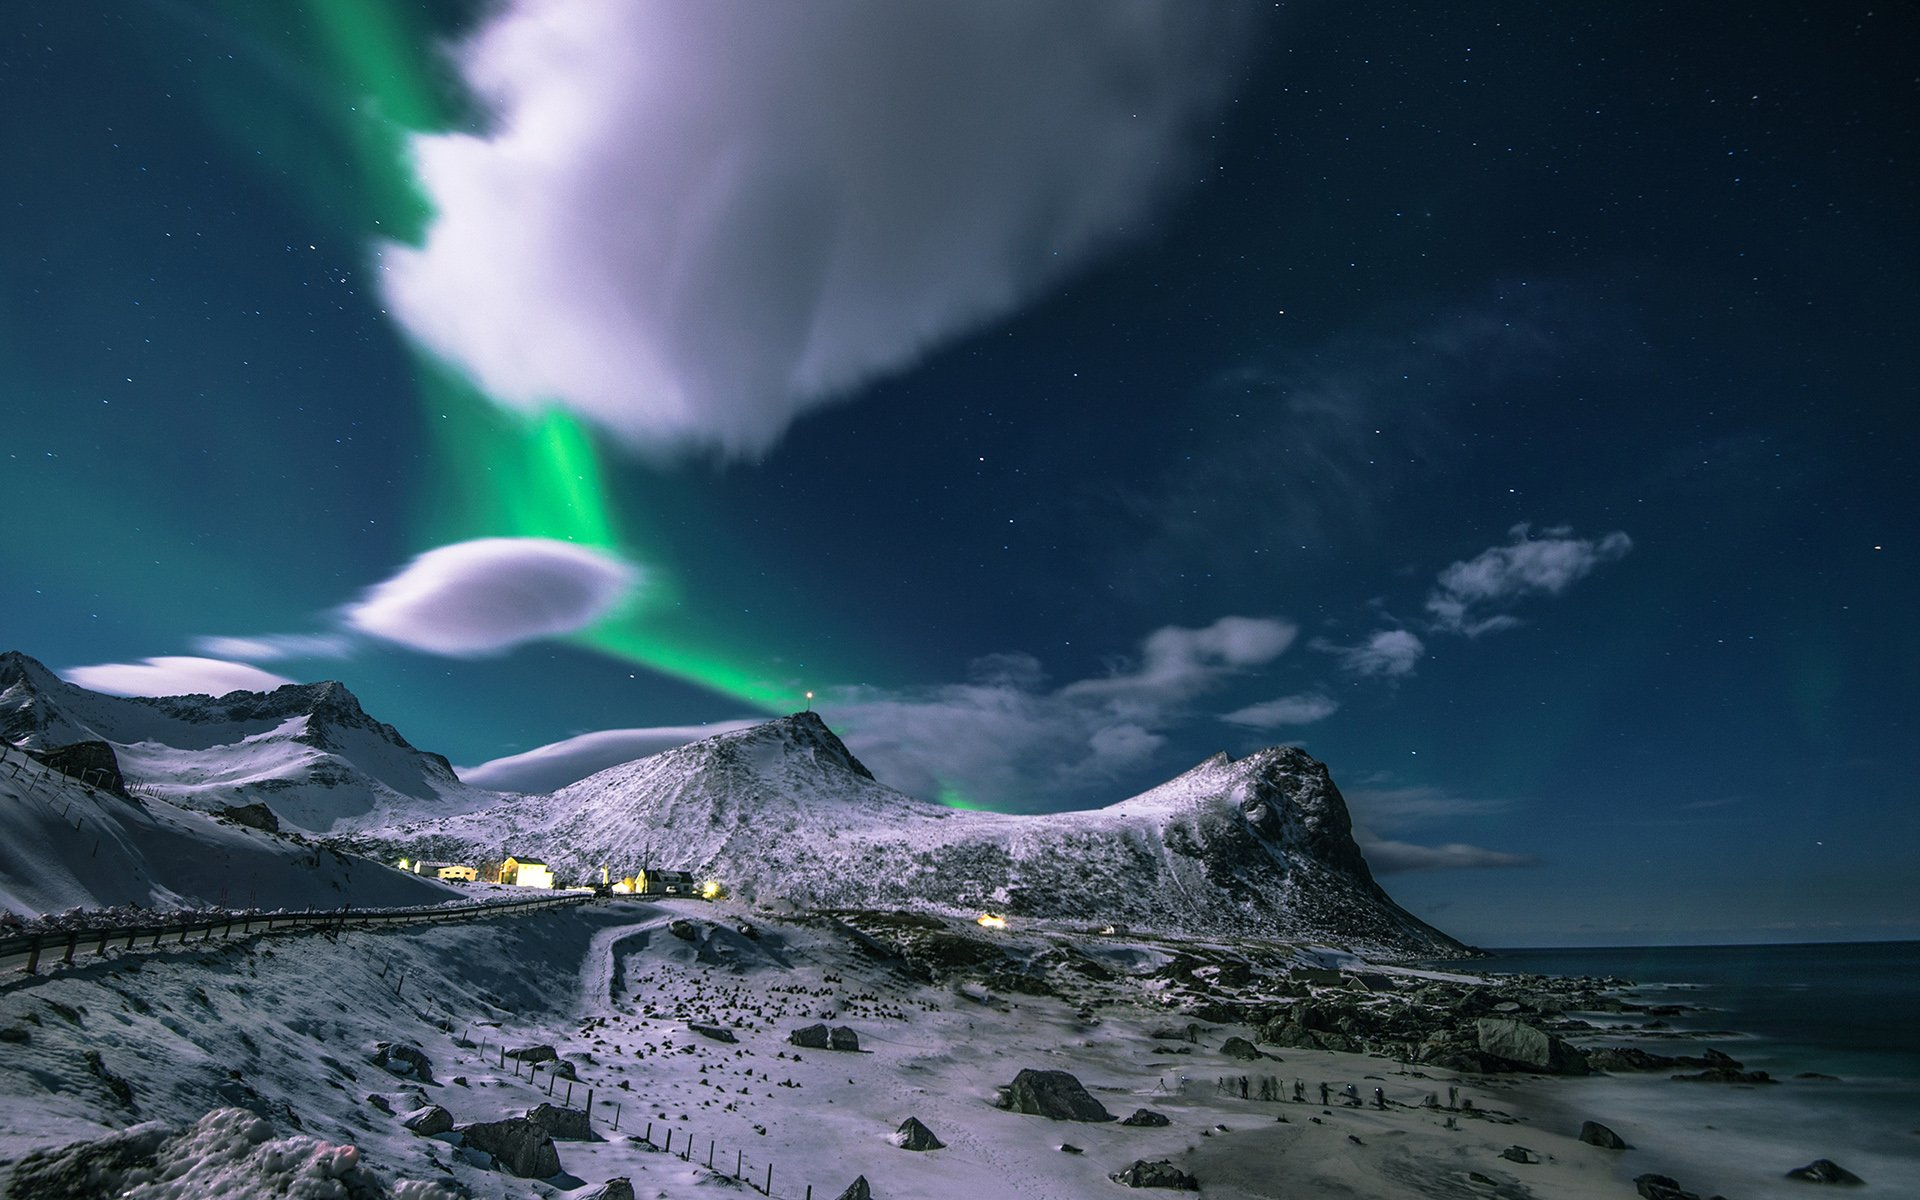 northern lights wallpaper 4k - photo #24